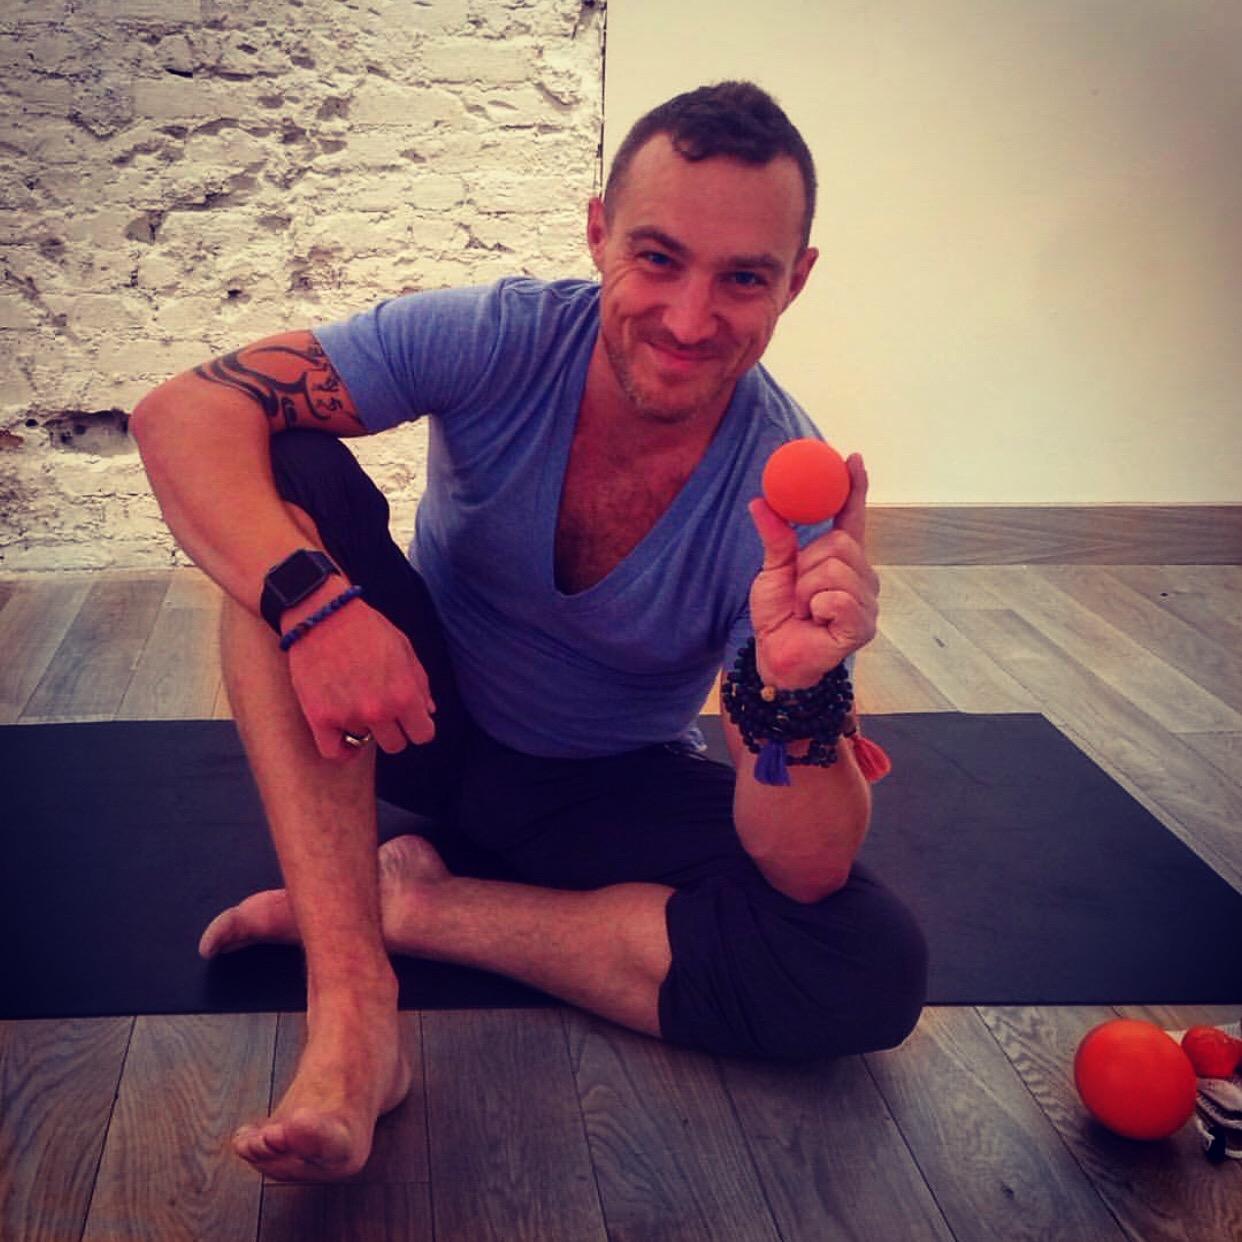 Holy Roller Vinyasa - Self Myofascial Release in Yoga